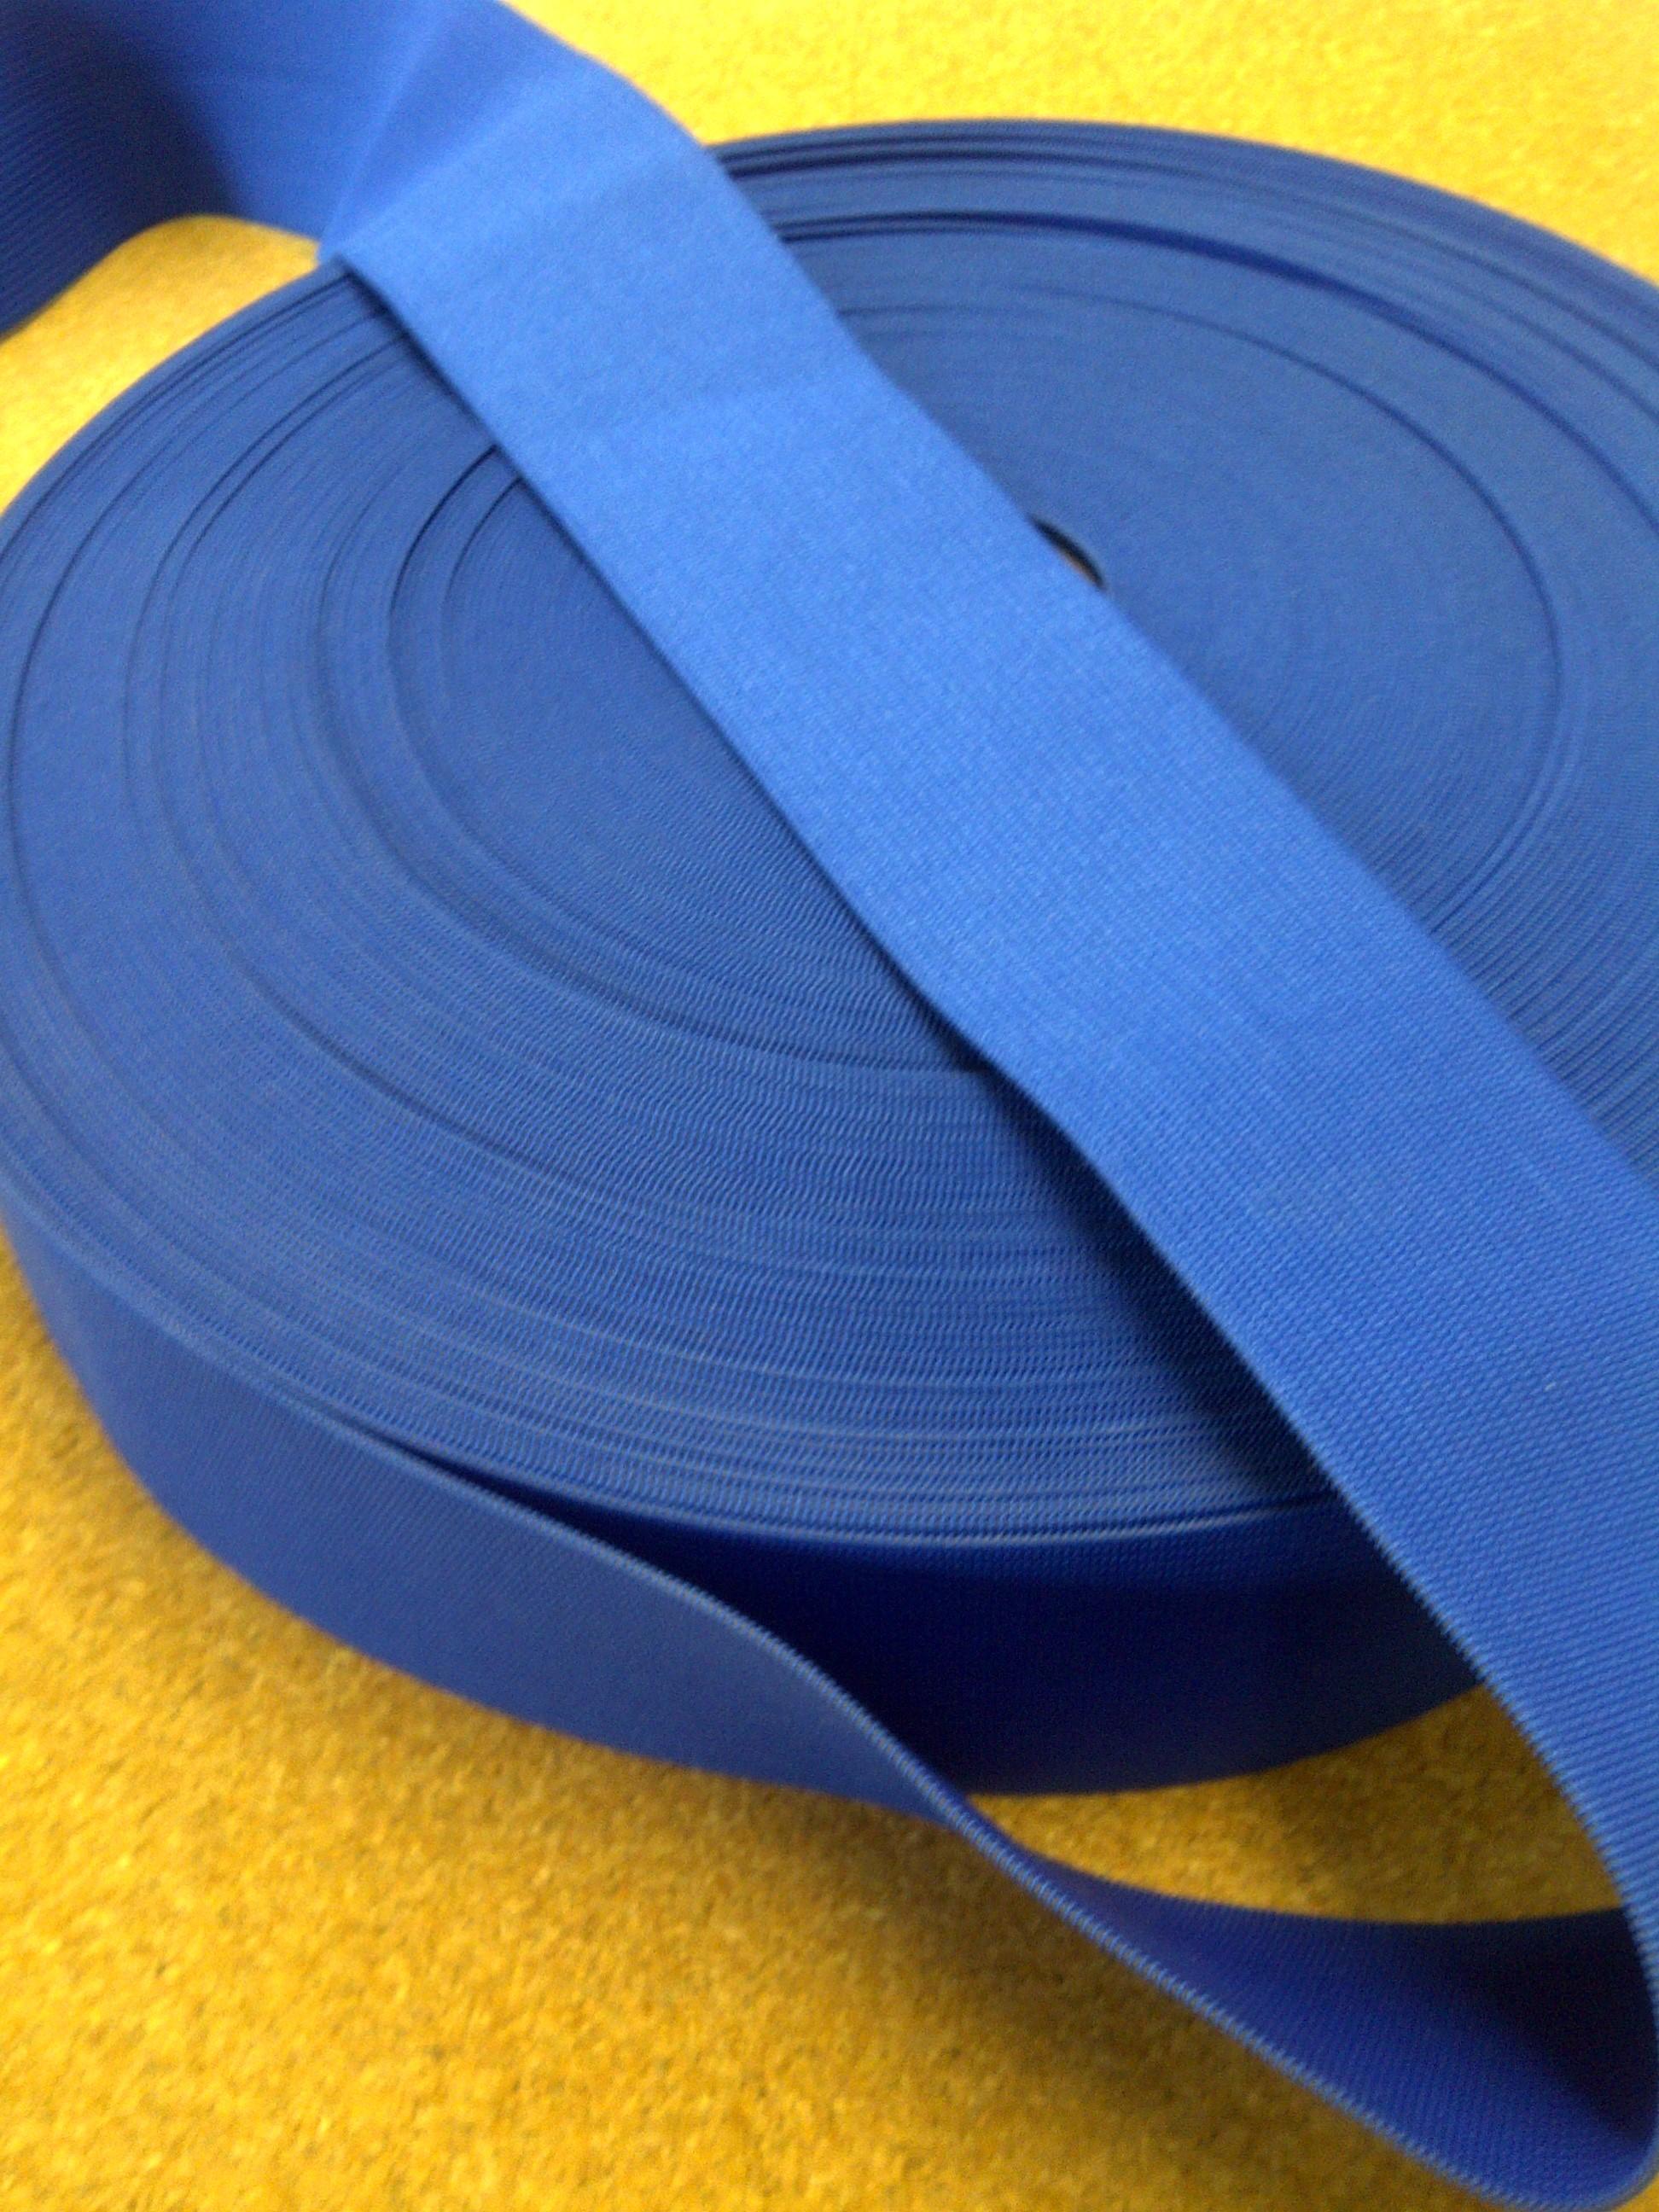 2 Inch Royal Blue Elastic Trimsonwheels Com